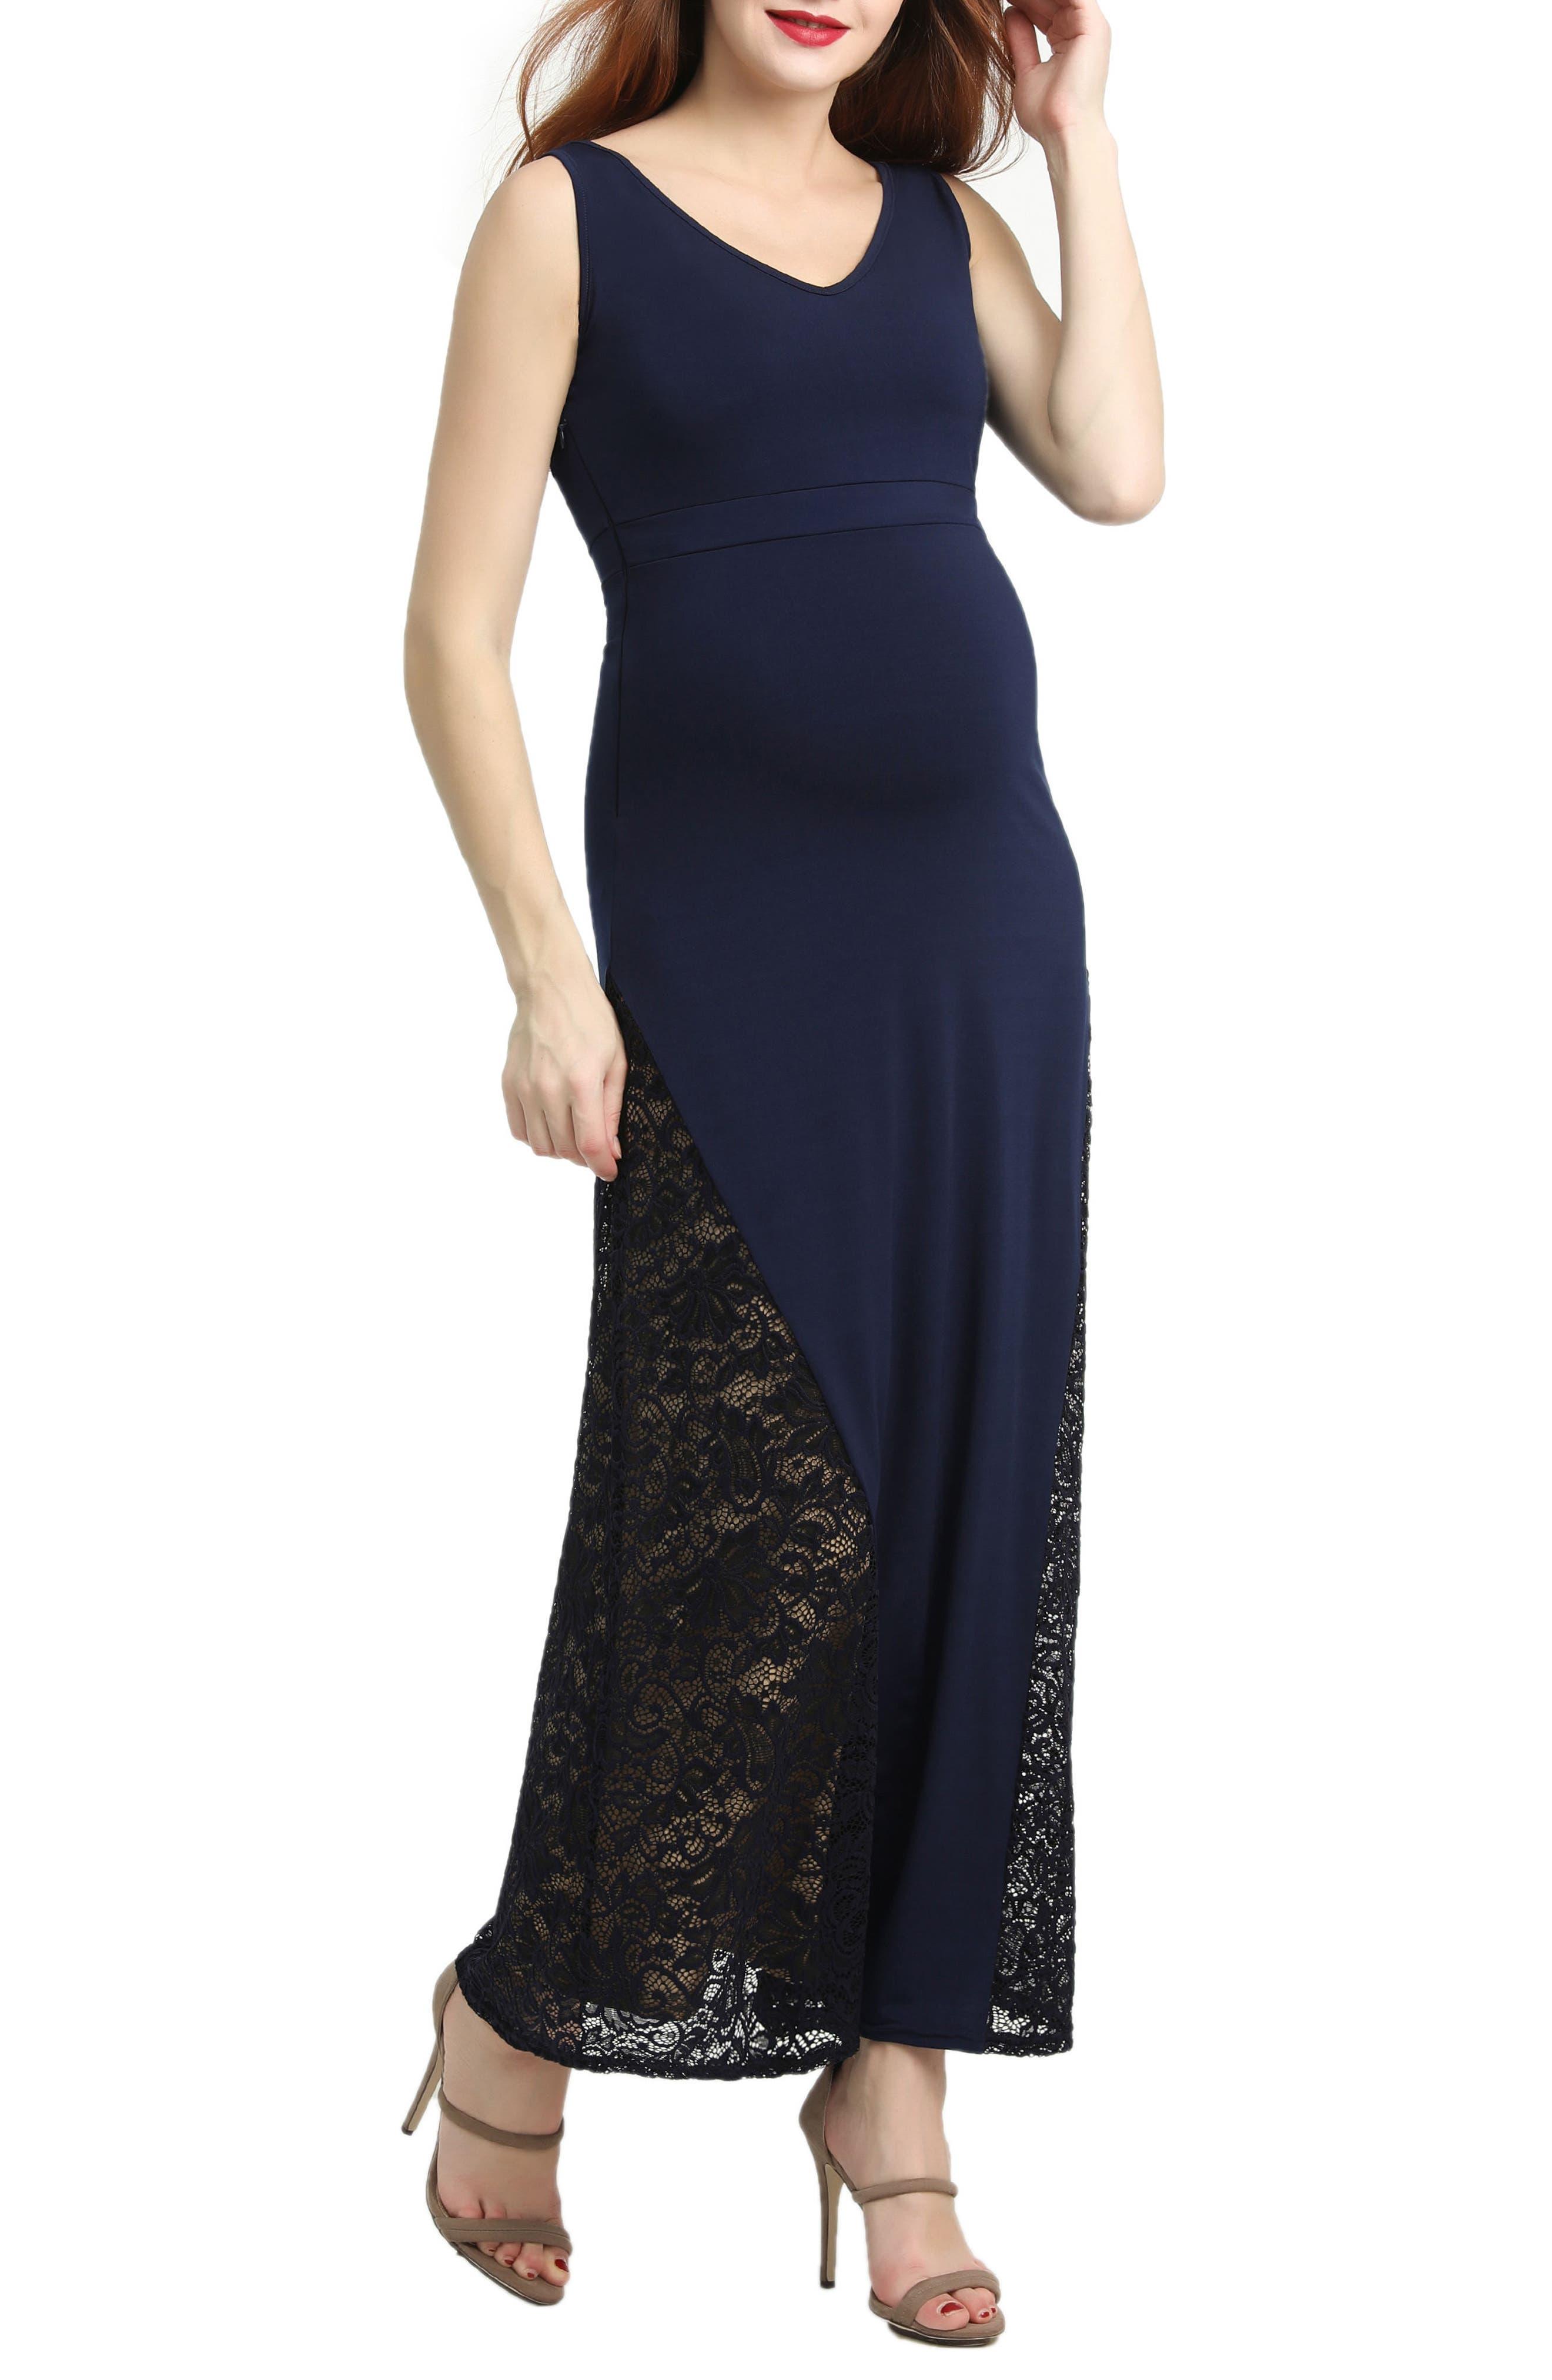 Kimi And Kai Elizabeth Lace Maternity Maxi Dress, Blue